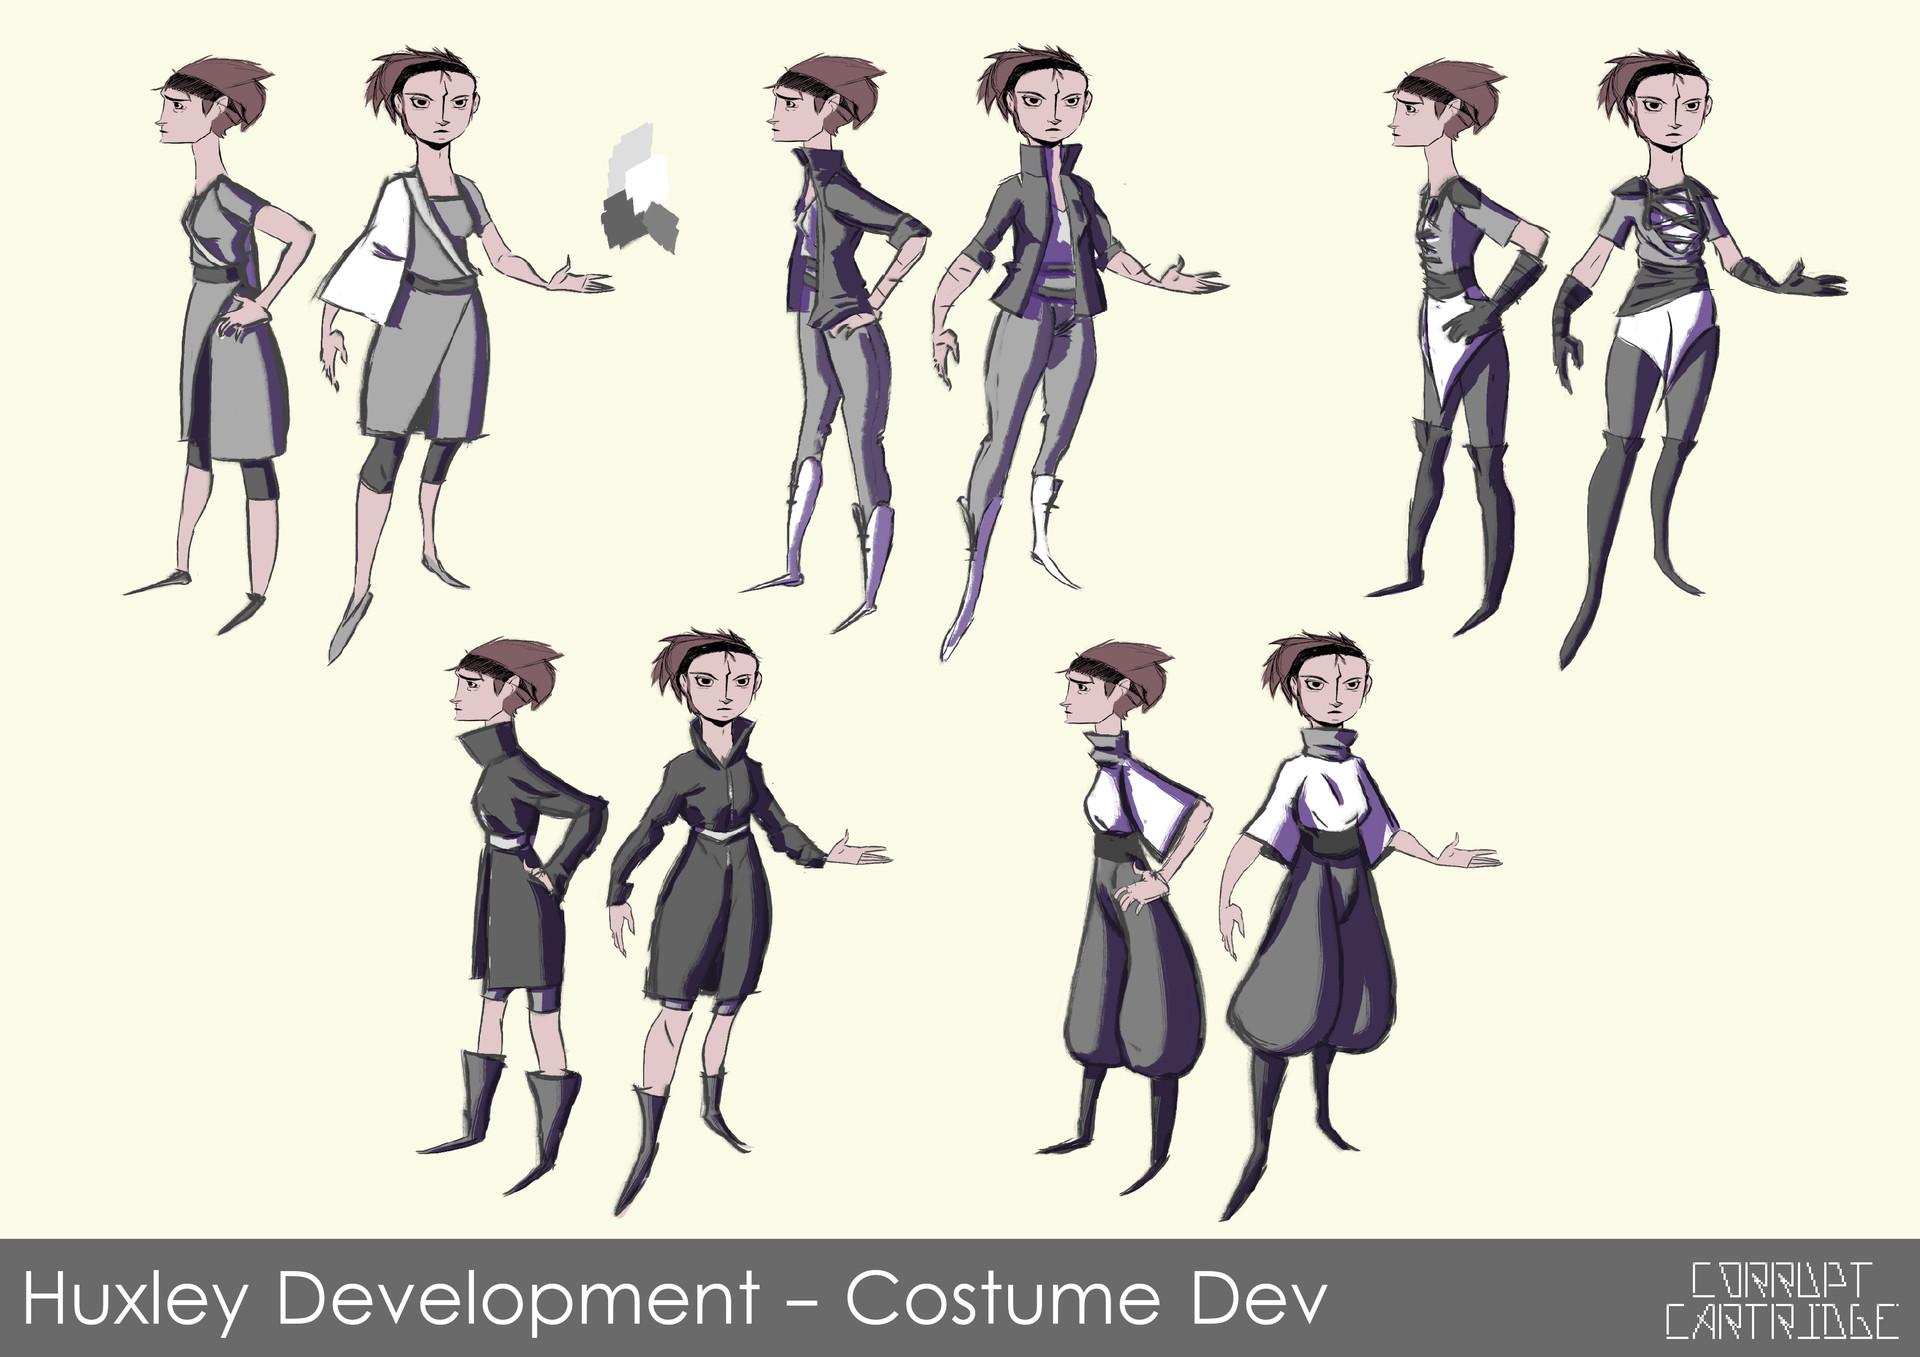 Craig mullins 04 huxley costume concepts 01